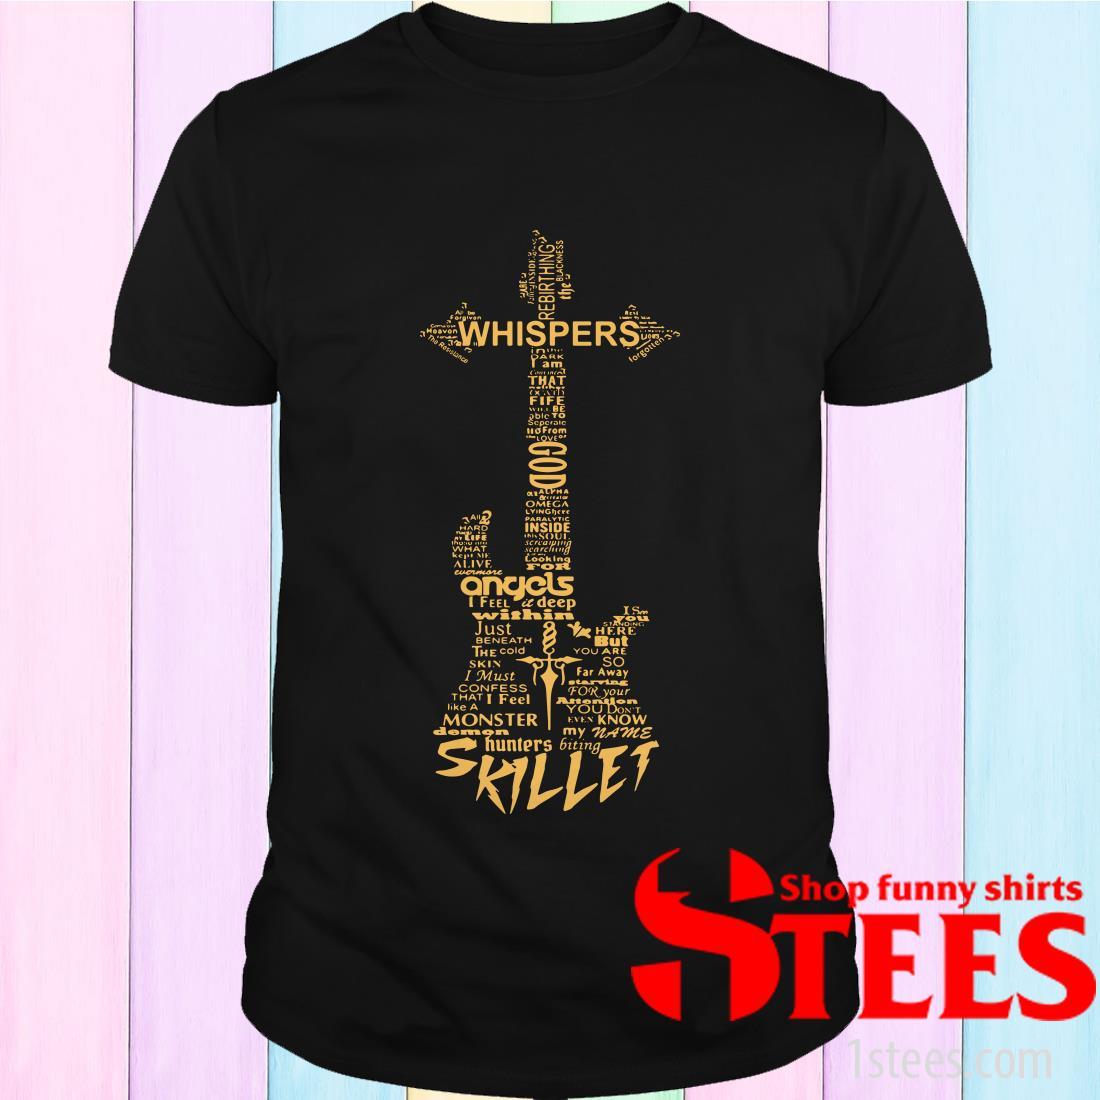 Whispers God Angles Skillet Band Christ Guitar Shirt